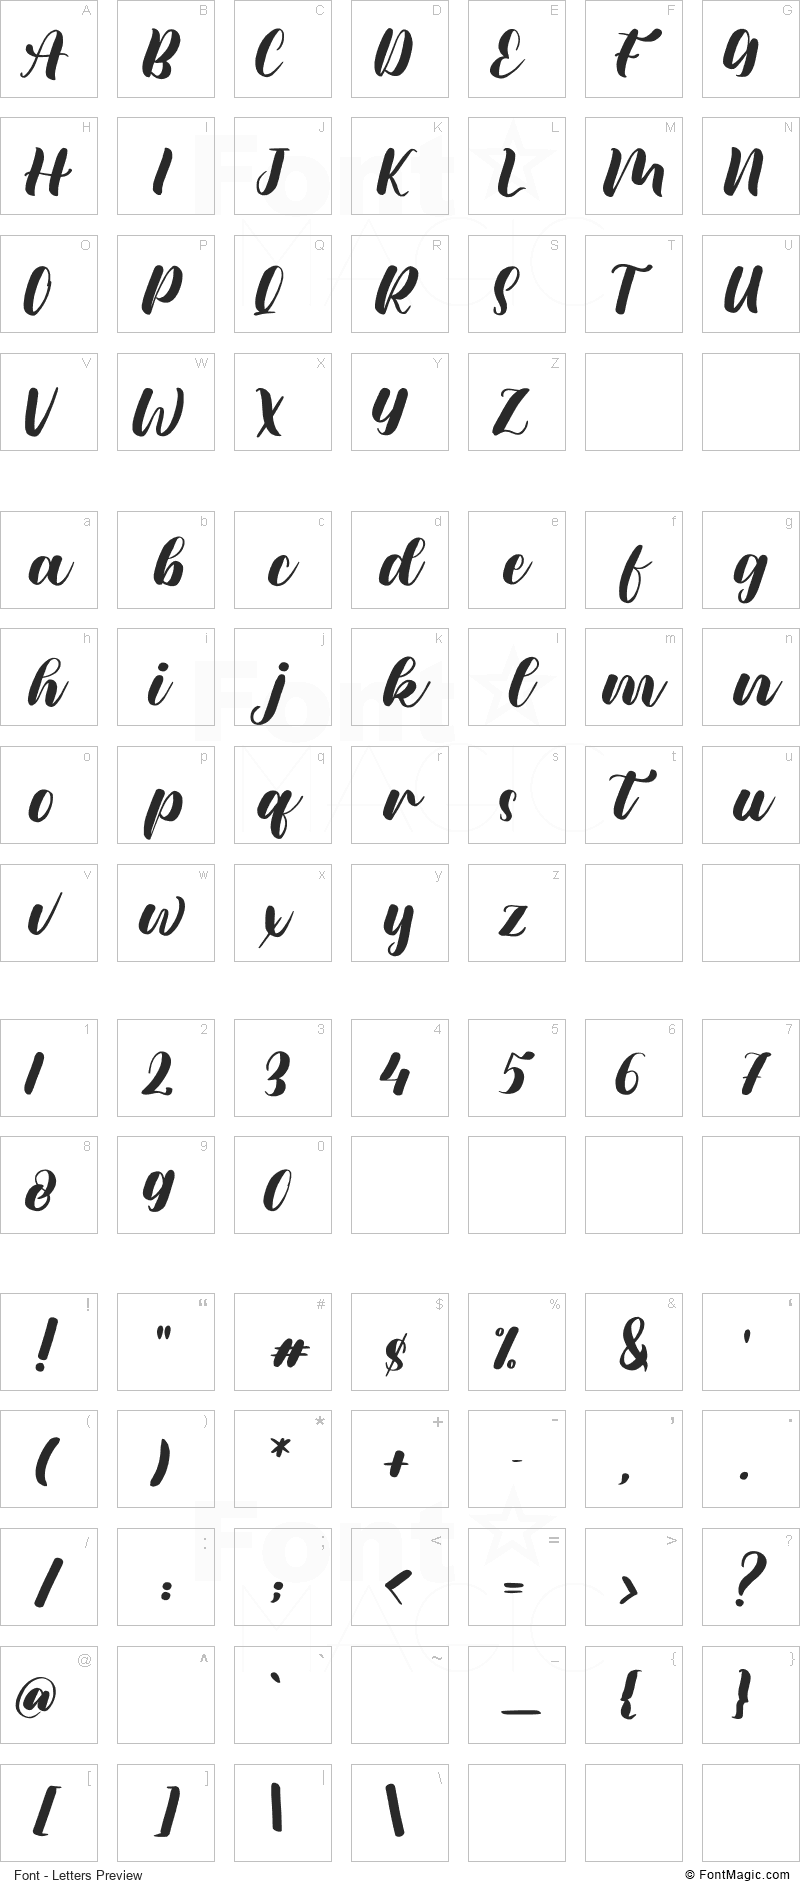 Meylani Font - All Latters Preview Chart